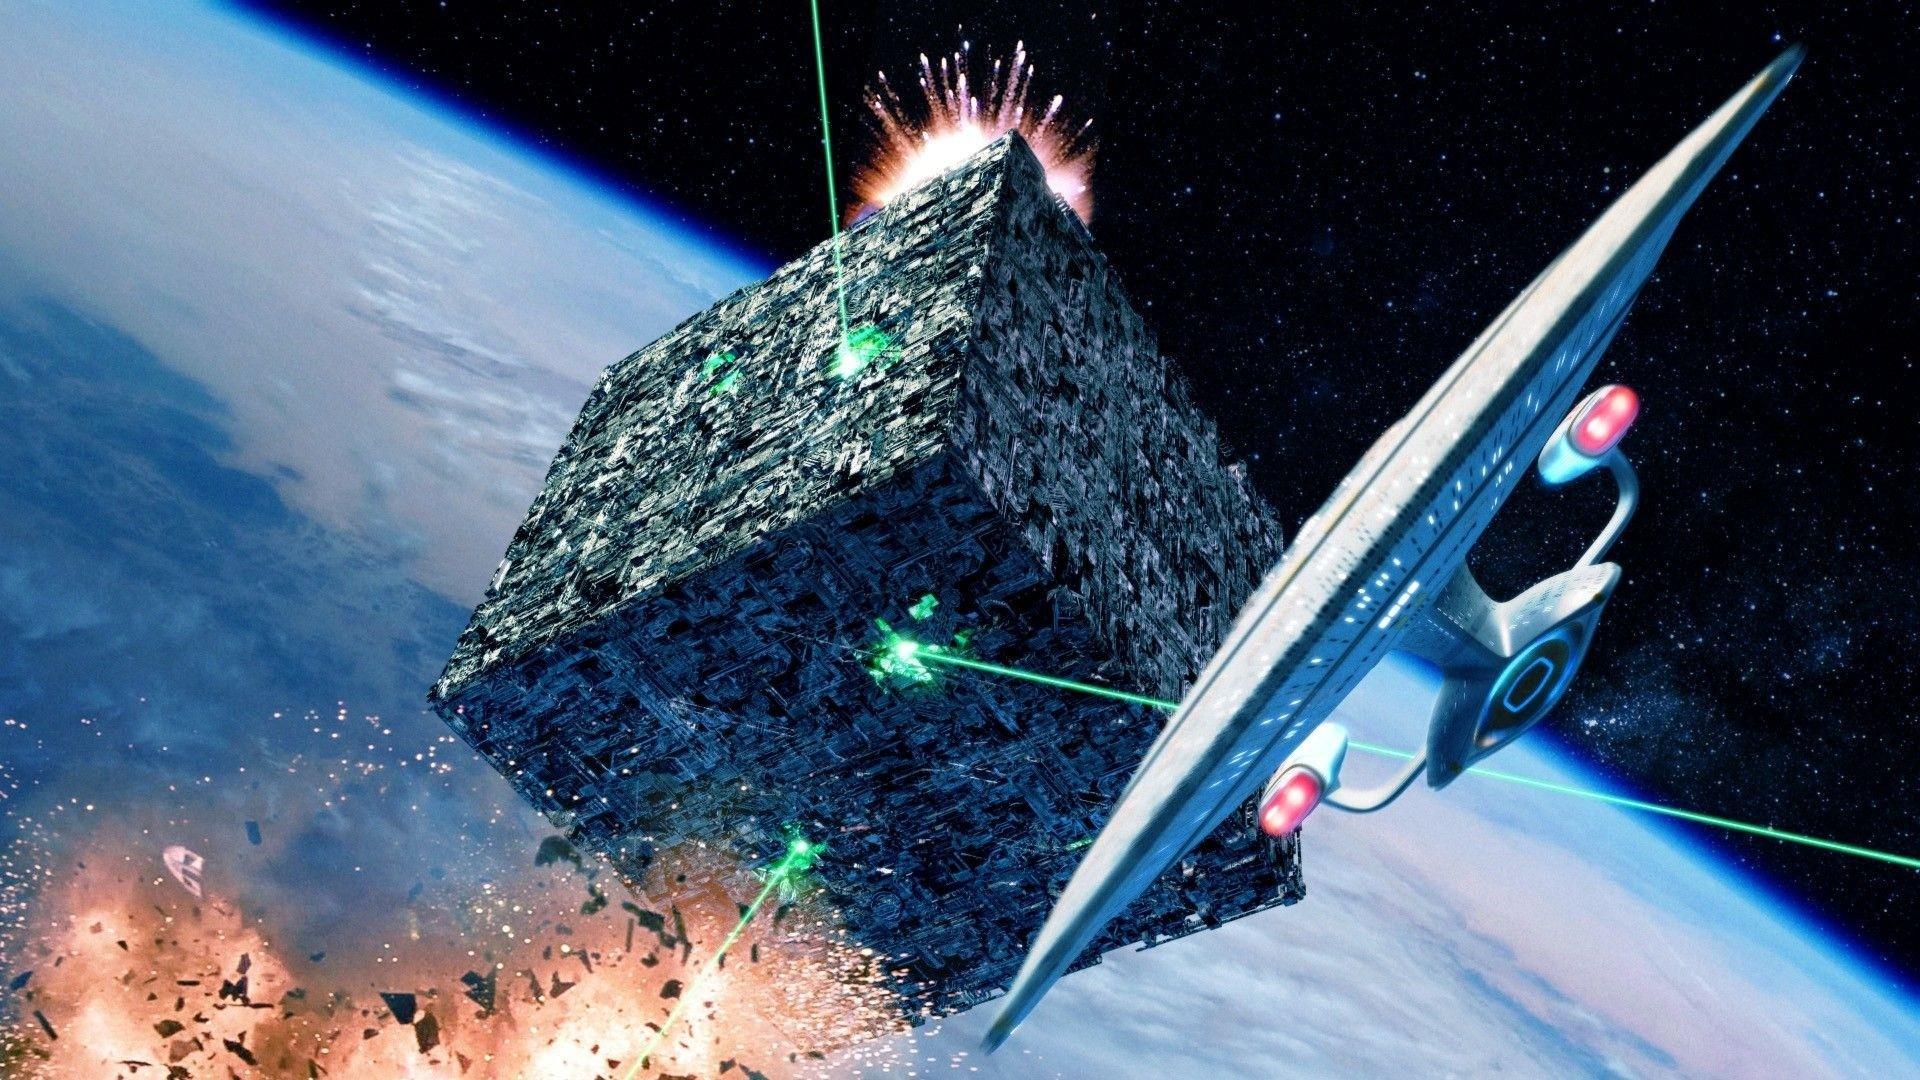 Star Trek Wallpaper image hd